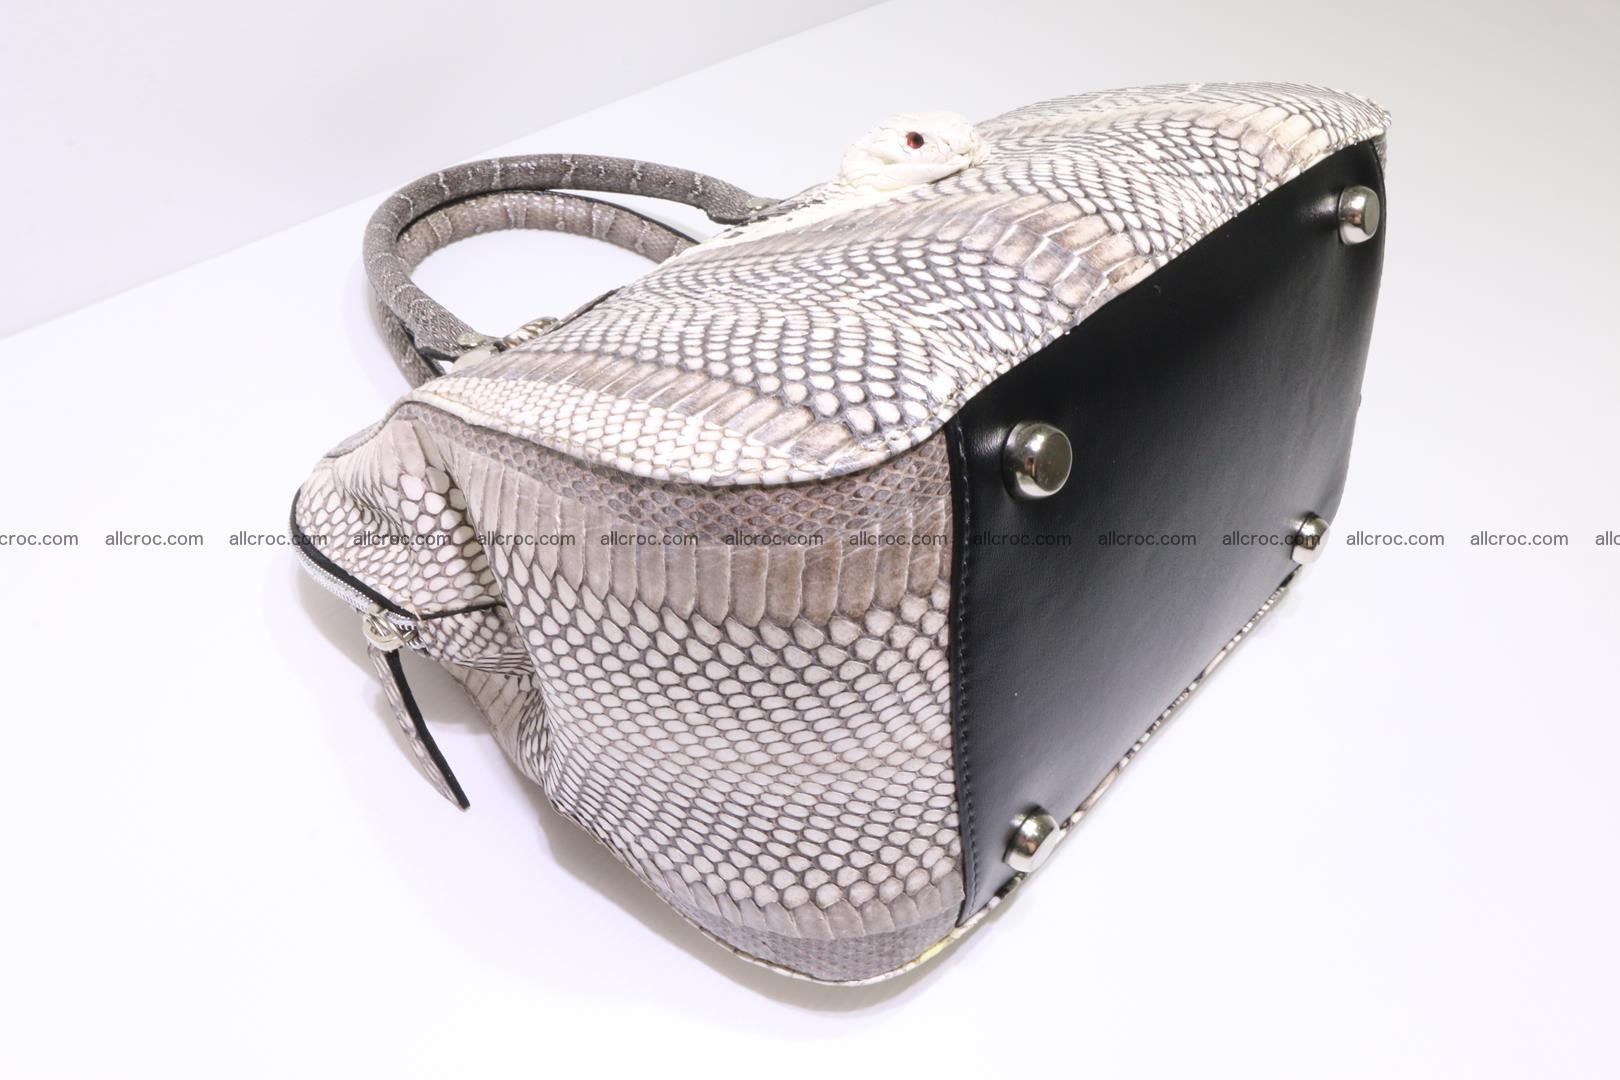 Cobra skin ladies handbag with head of cobra 193 Foto 10